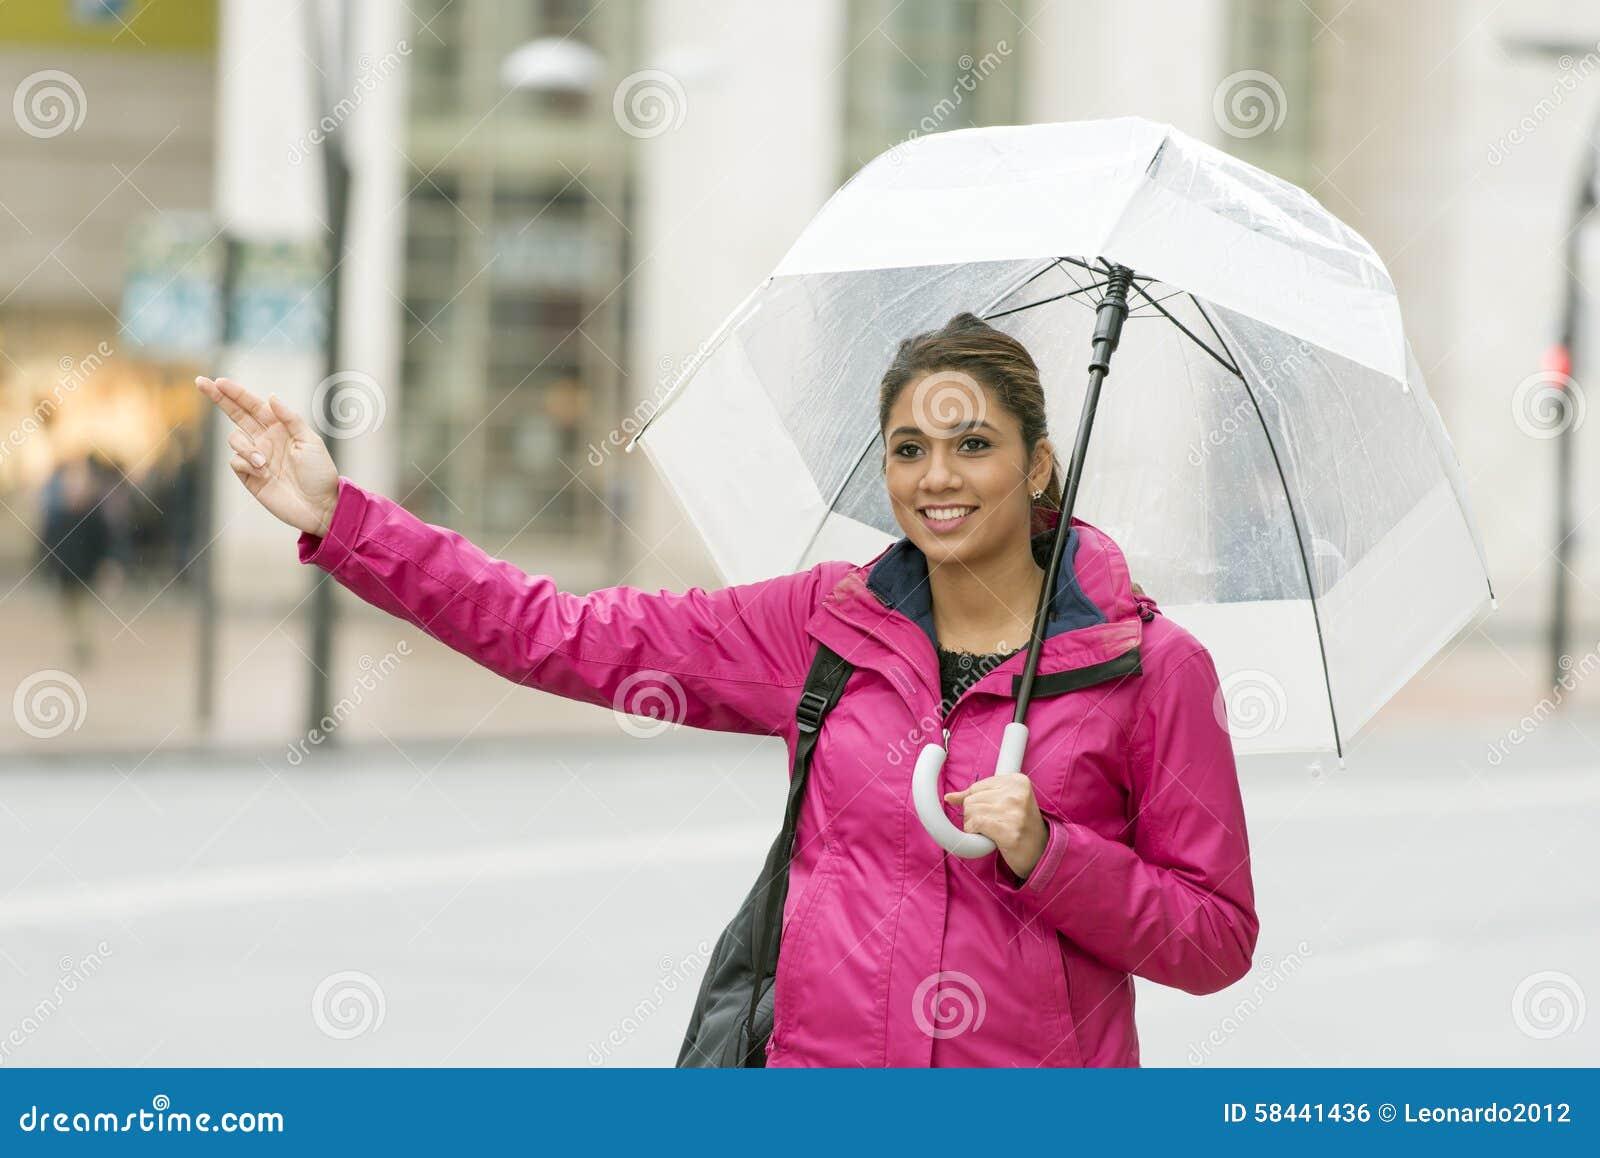 Mulher latin bonita com guarda-chuva que viaja na rua